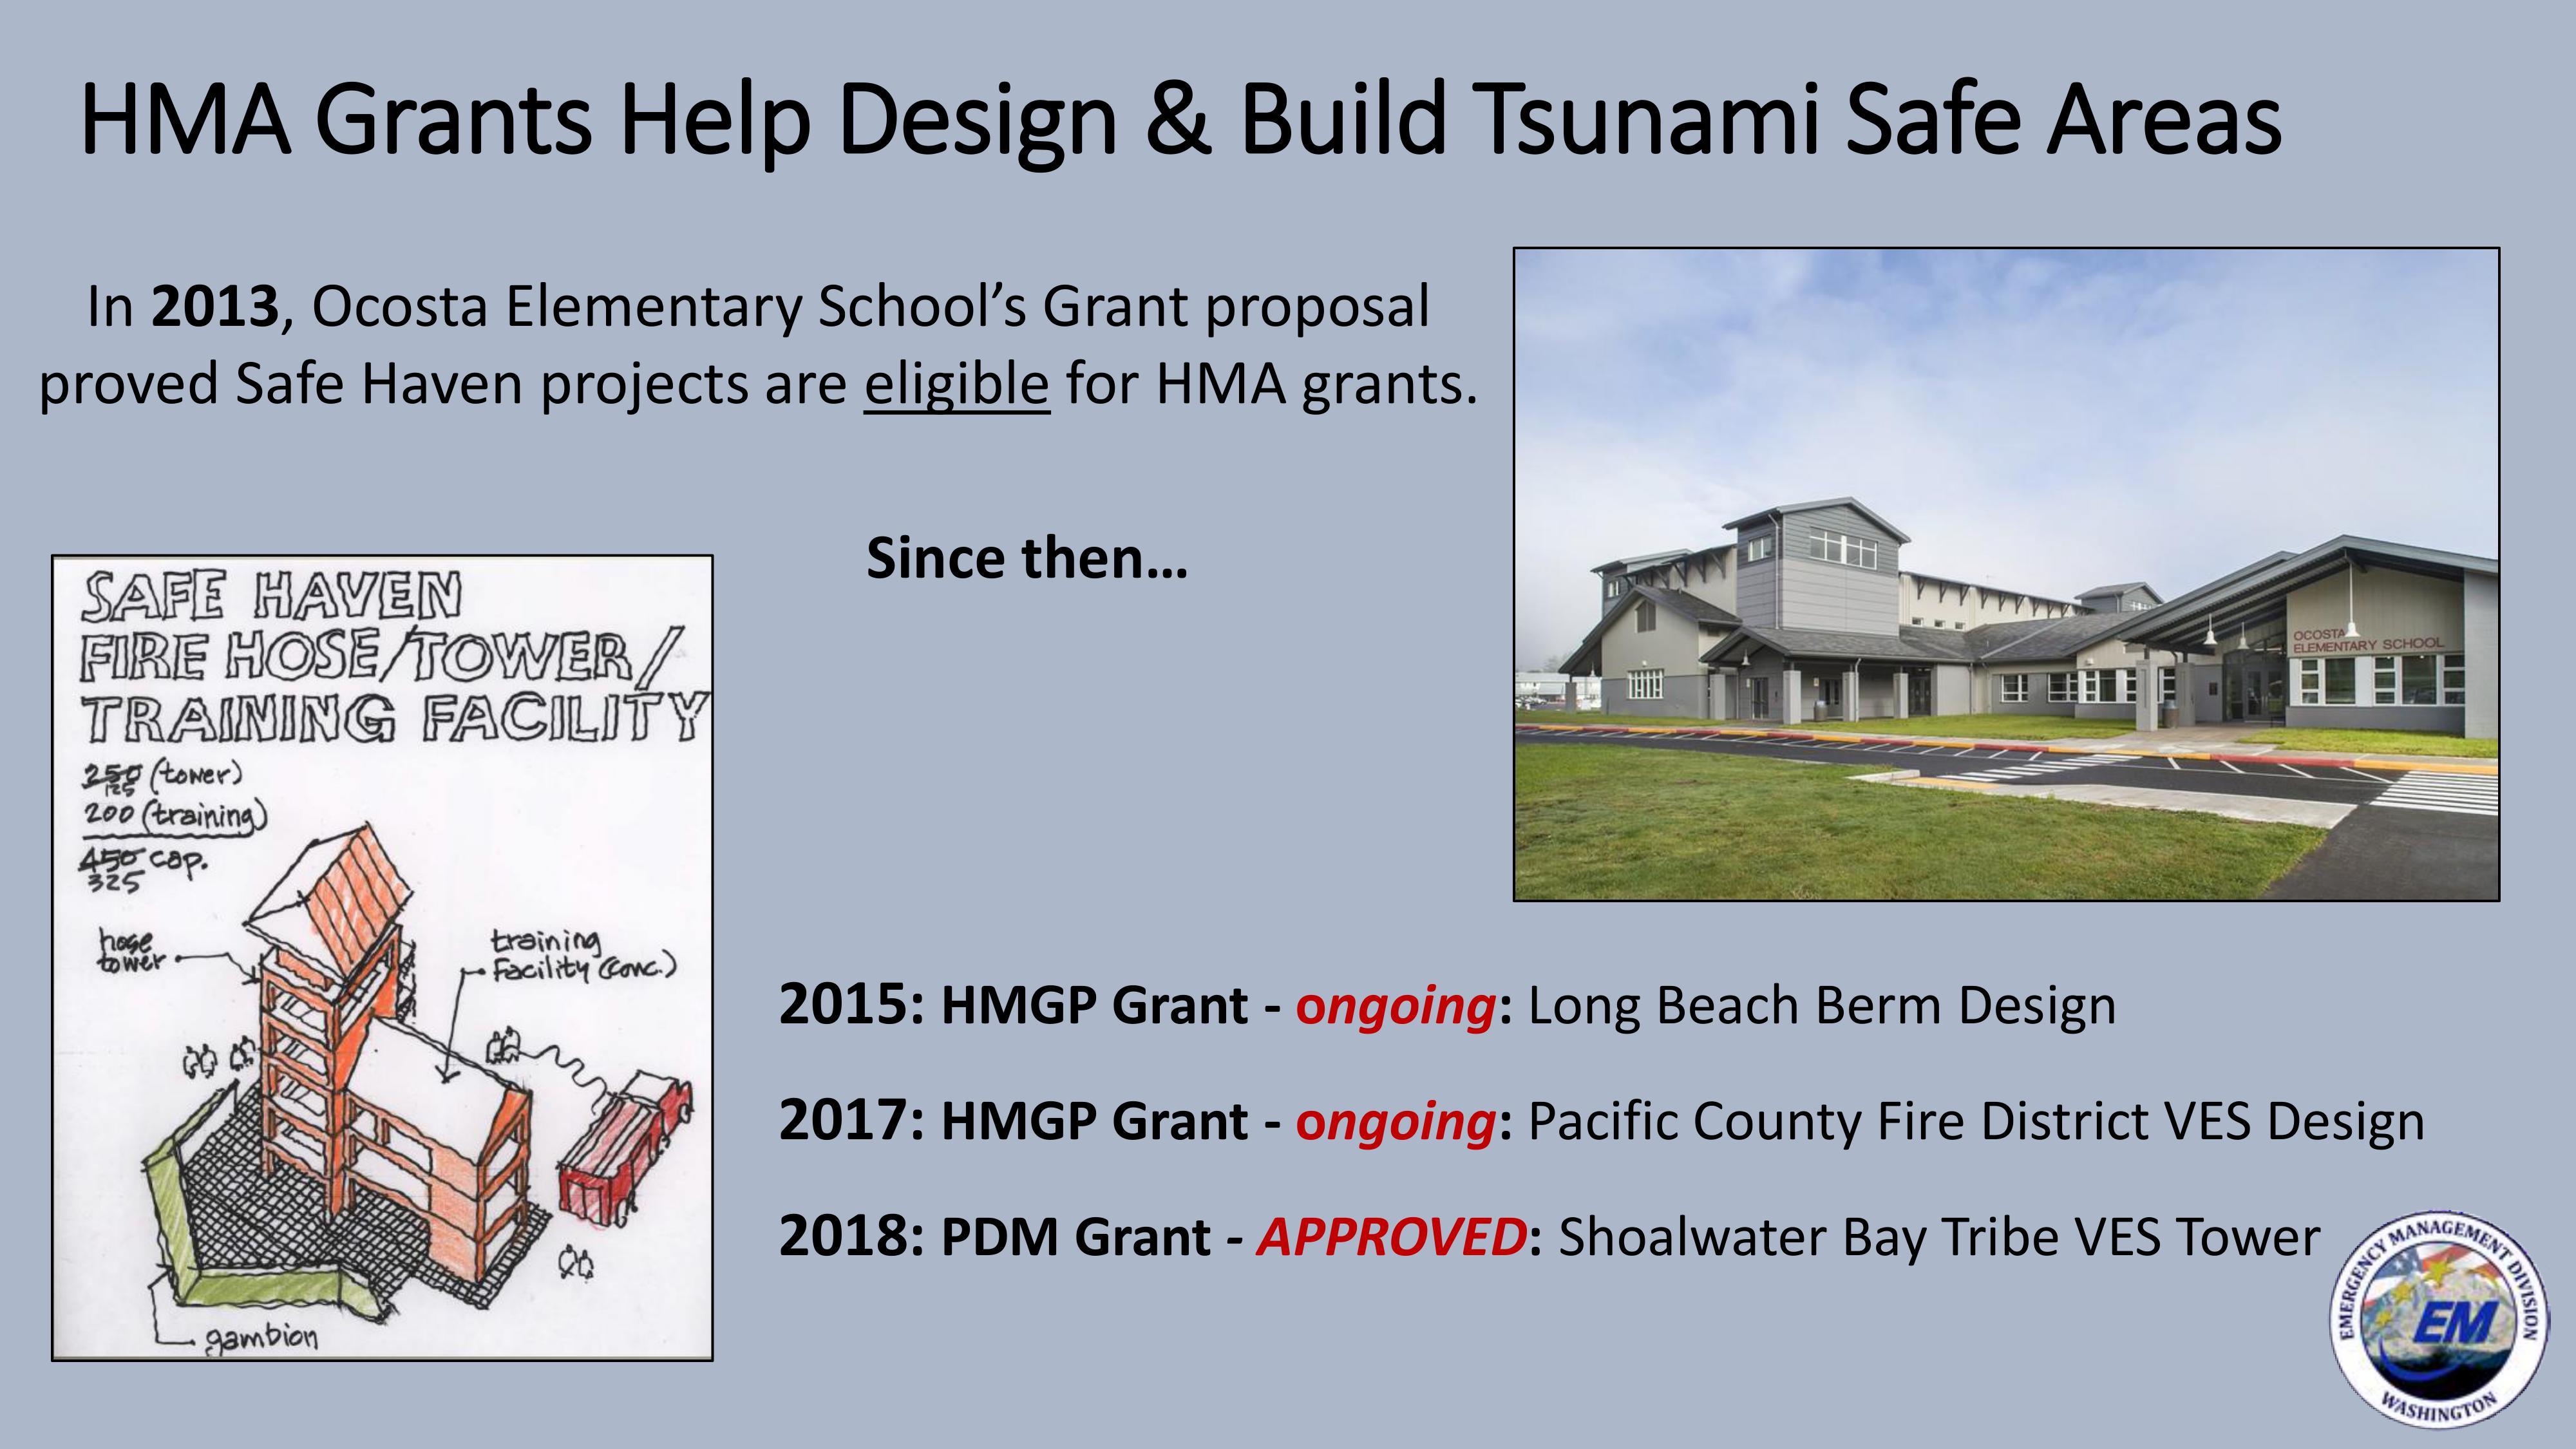 Celebrating a new tsunami vertical evacuation refuge for the